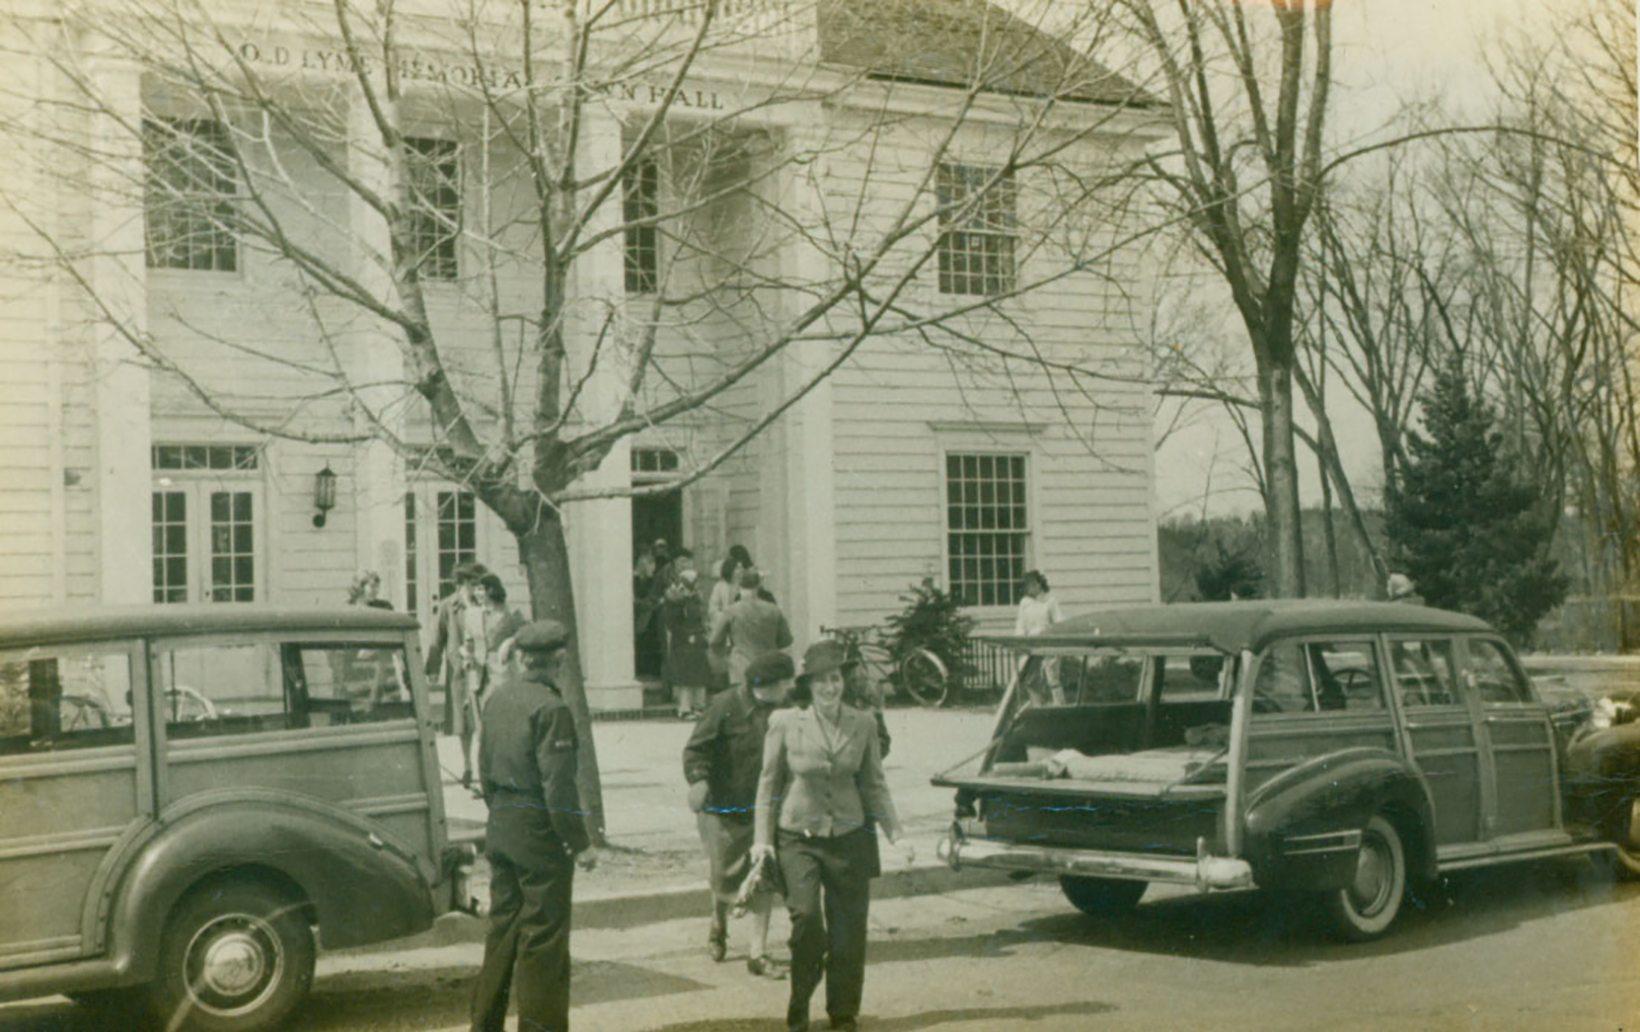 Photographs: Civil Defense Training, Old Lyme, 1942